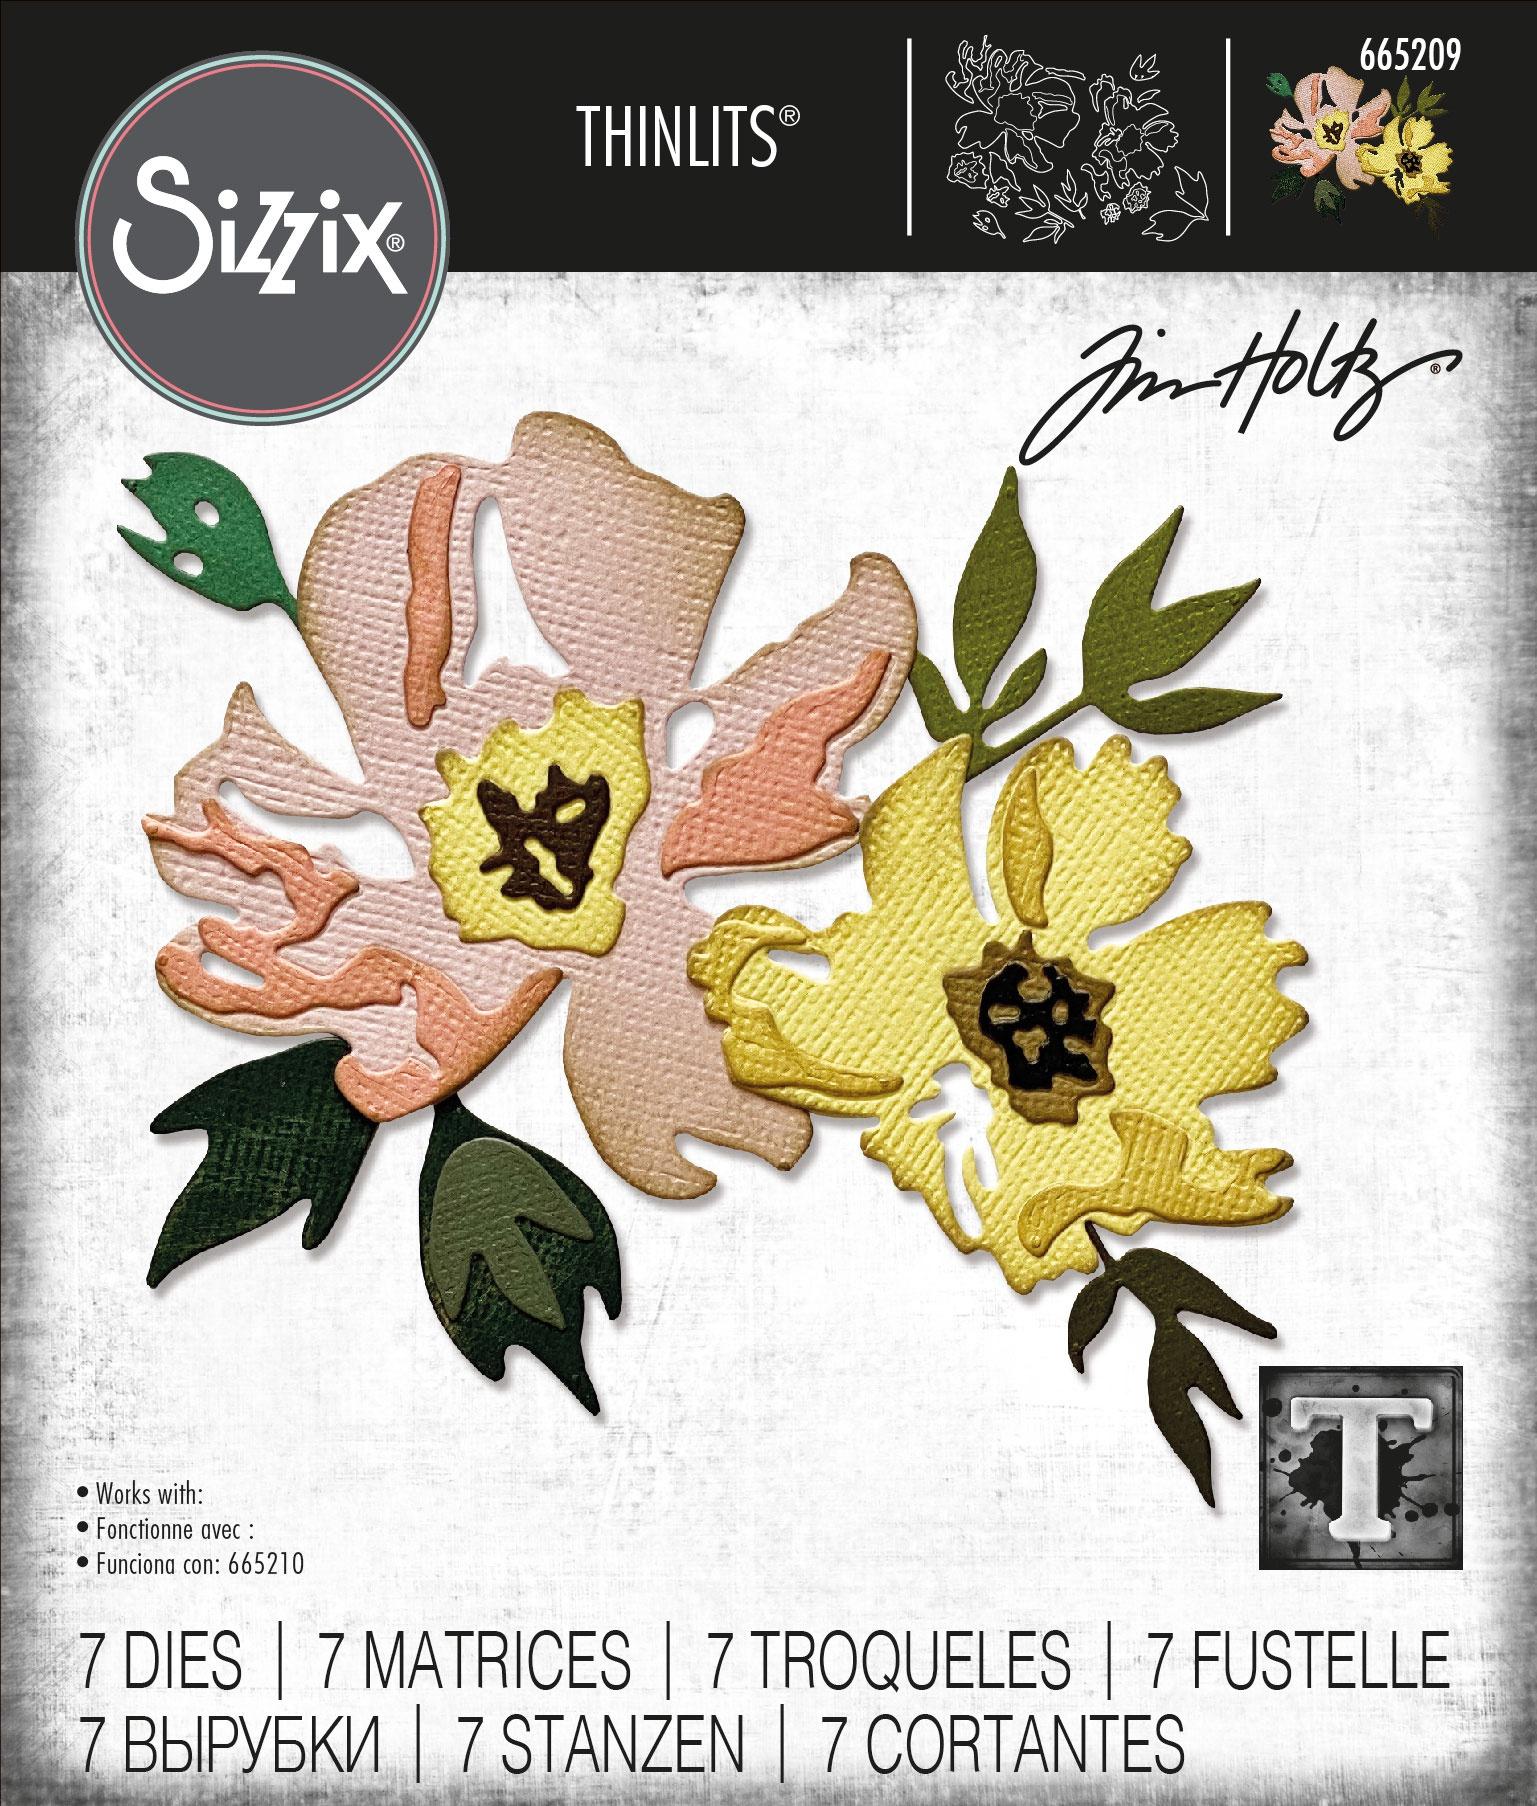 Sizzix Thinlits Dies By Tim Holtz -Brushstroke Flowers #1